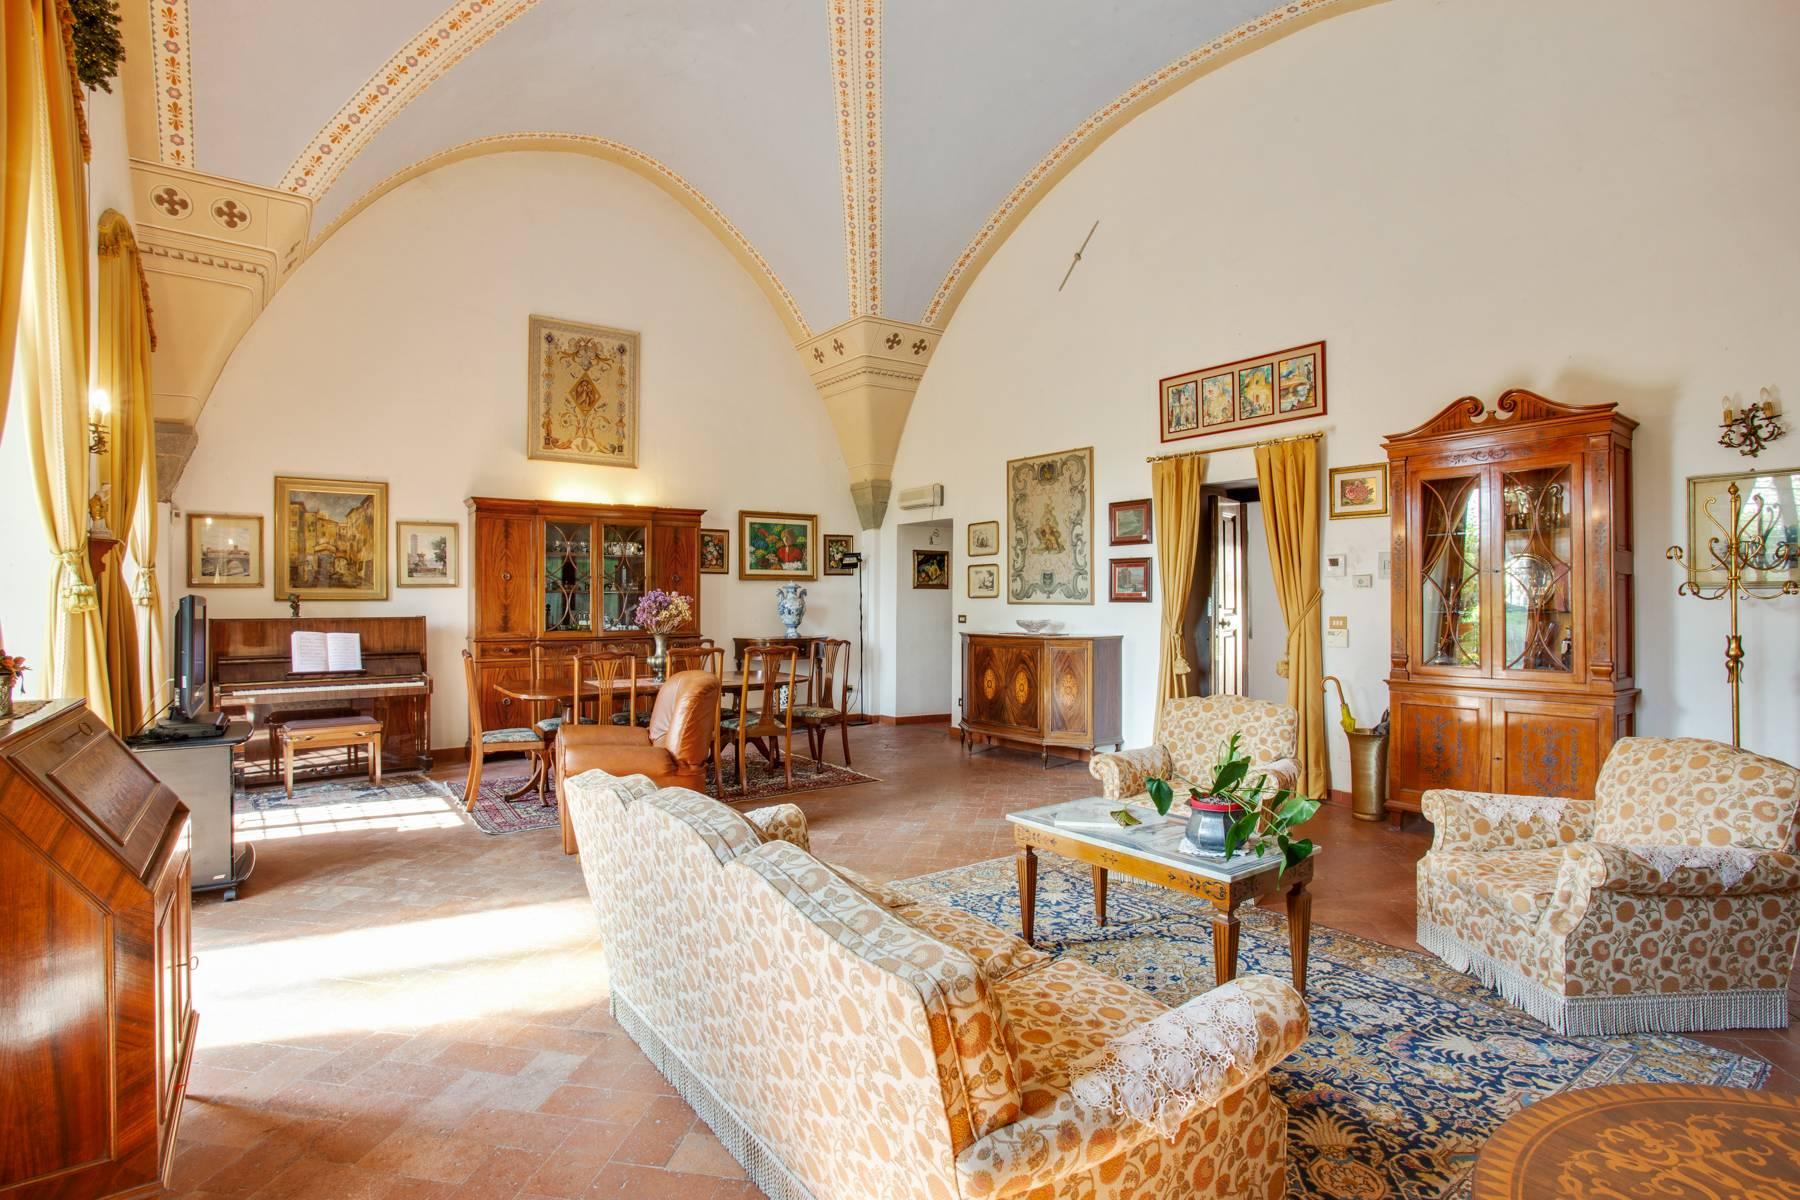 Appartamento in Vendita a Scandicci: 5 locali, 140 mq - Foto 1